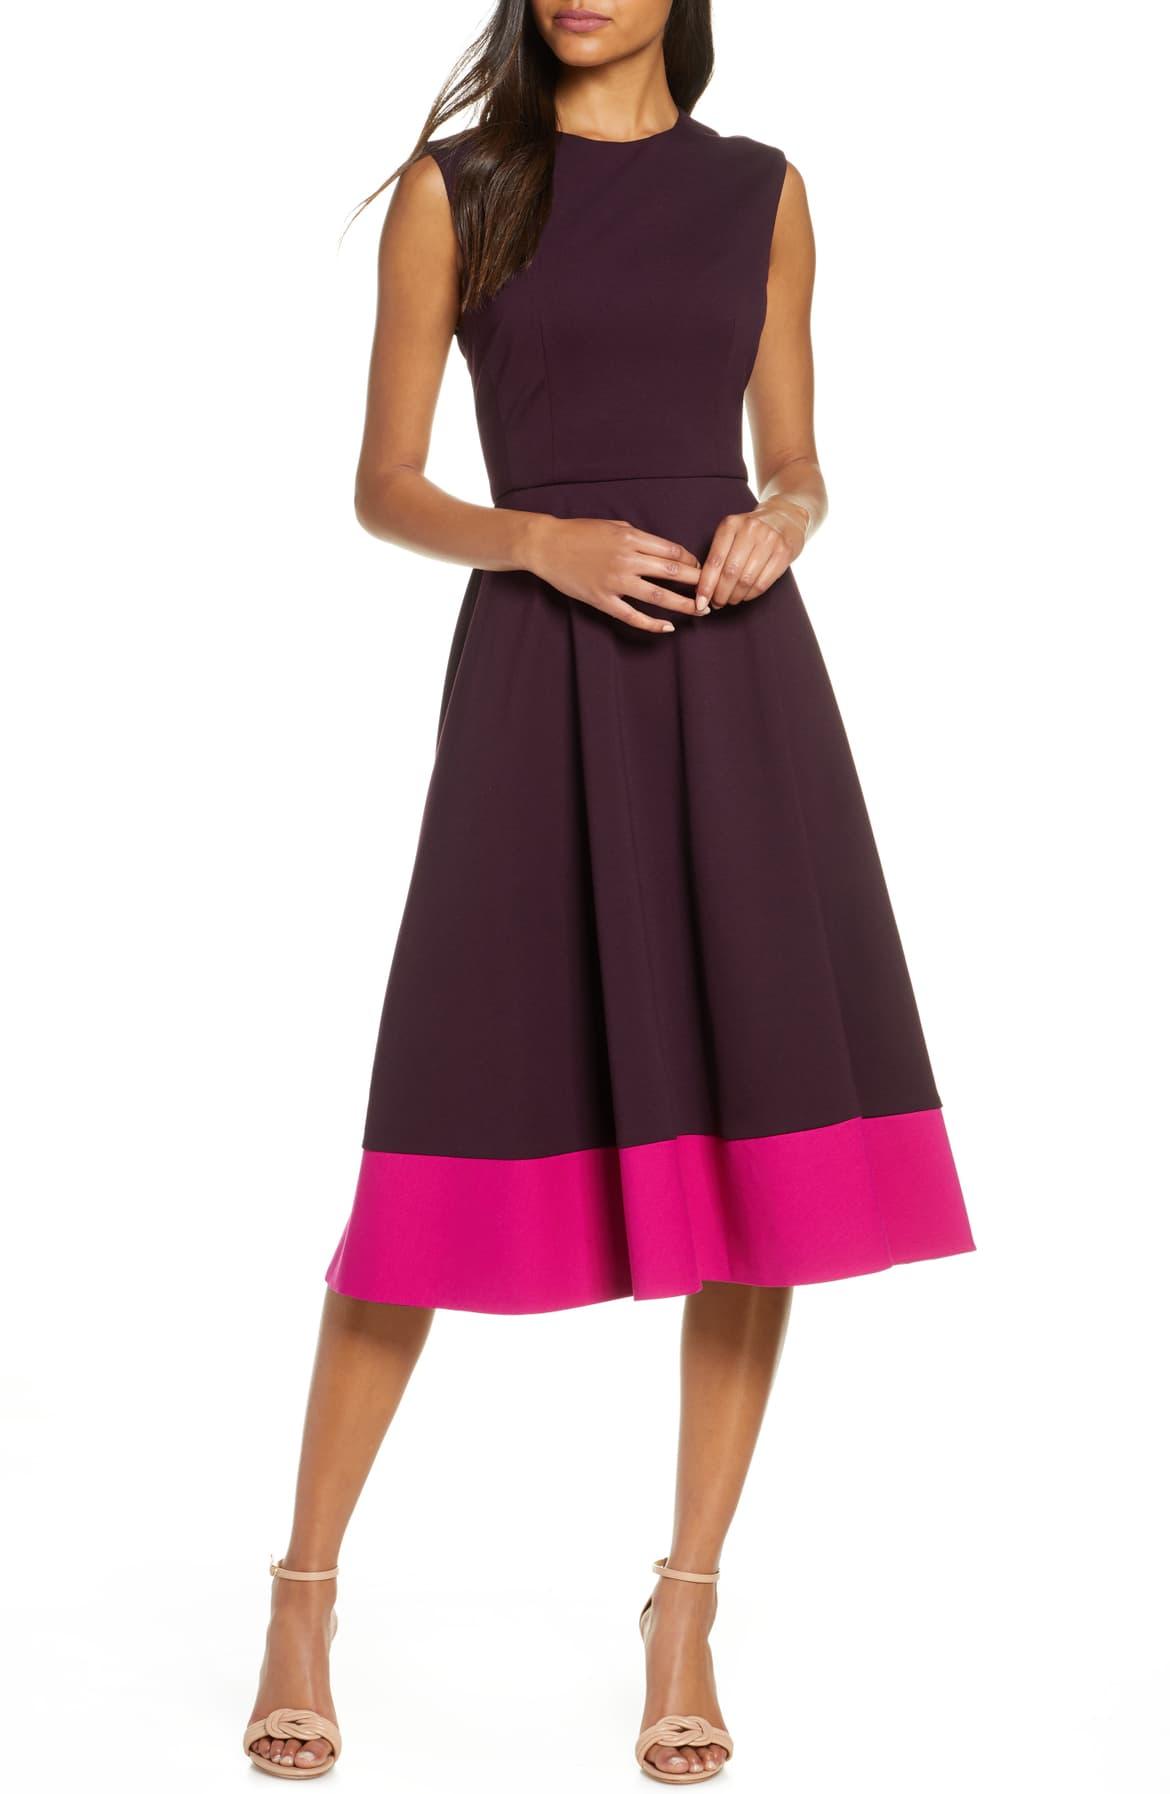 Contrast Hem Sleeveless Dress